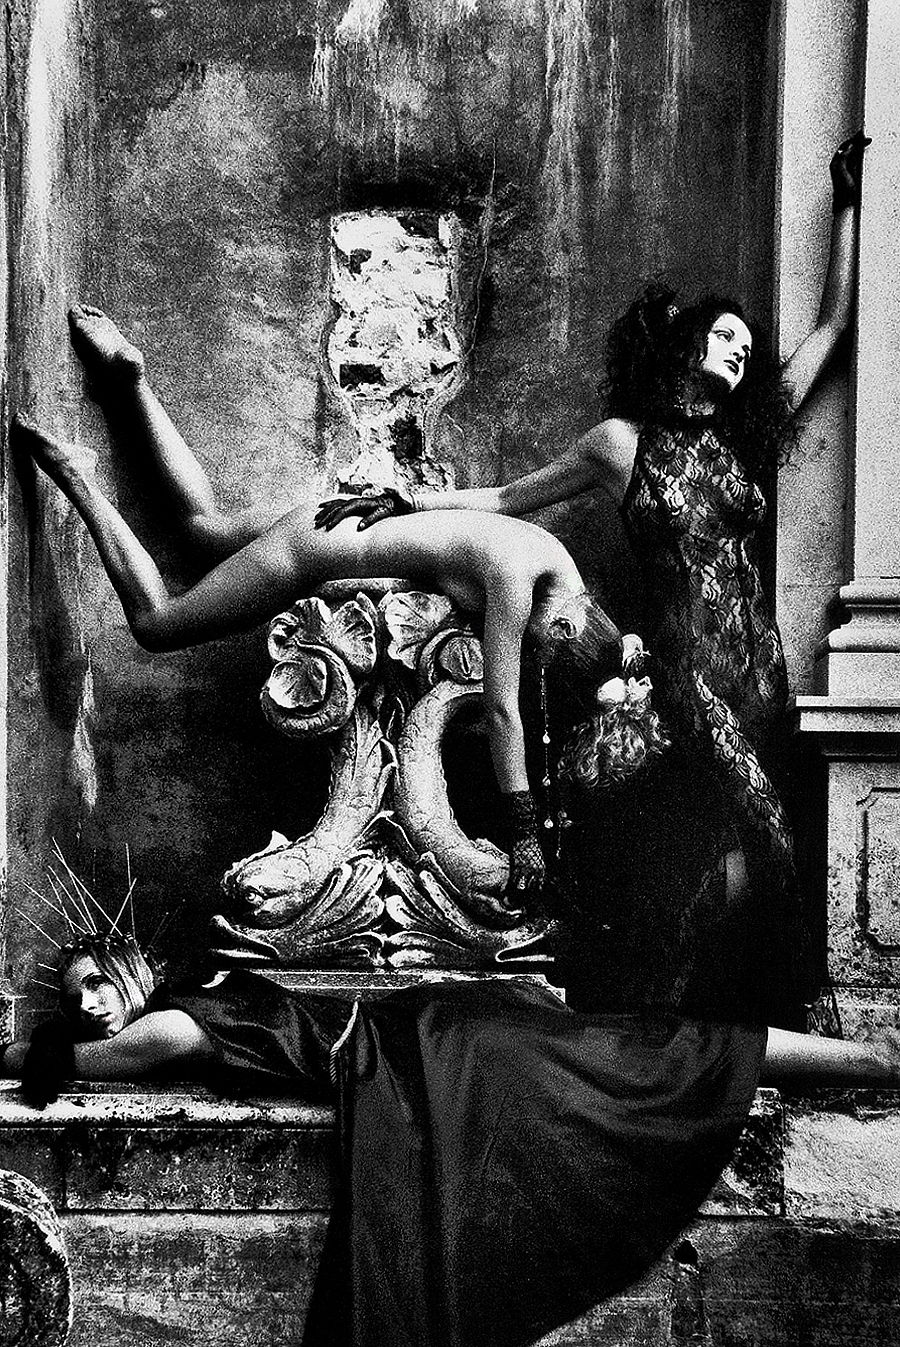 Tony_Ward_Tableaux_Vivant_Longwood_Gardens_portfolio_classics_fashion_nudes